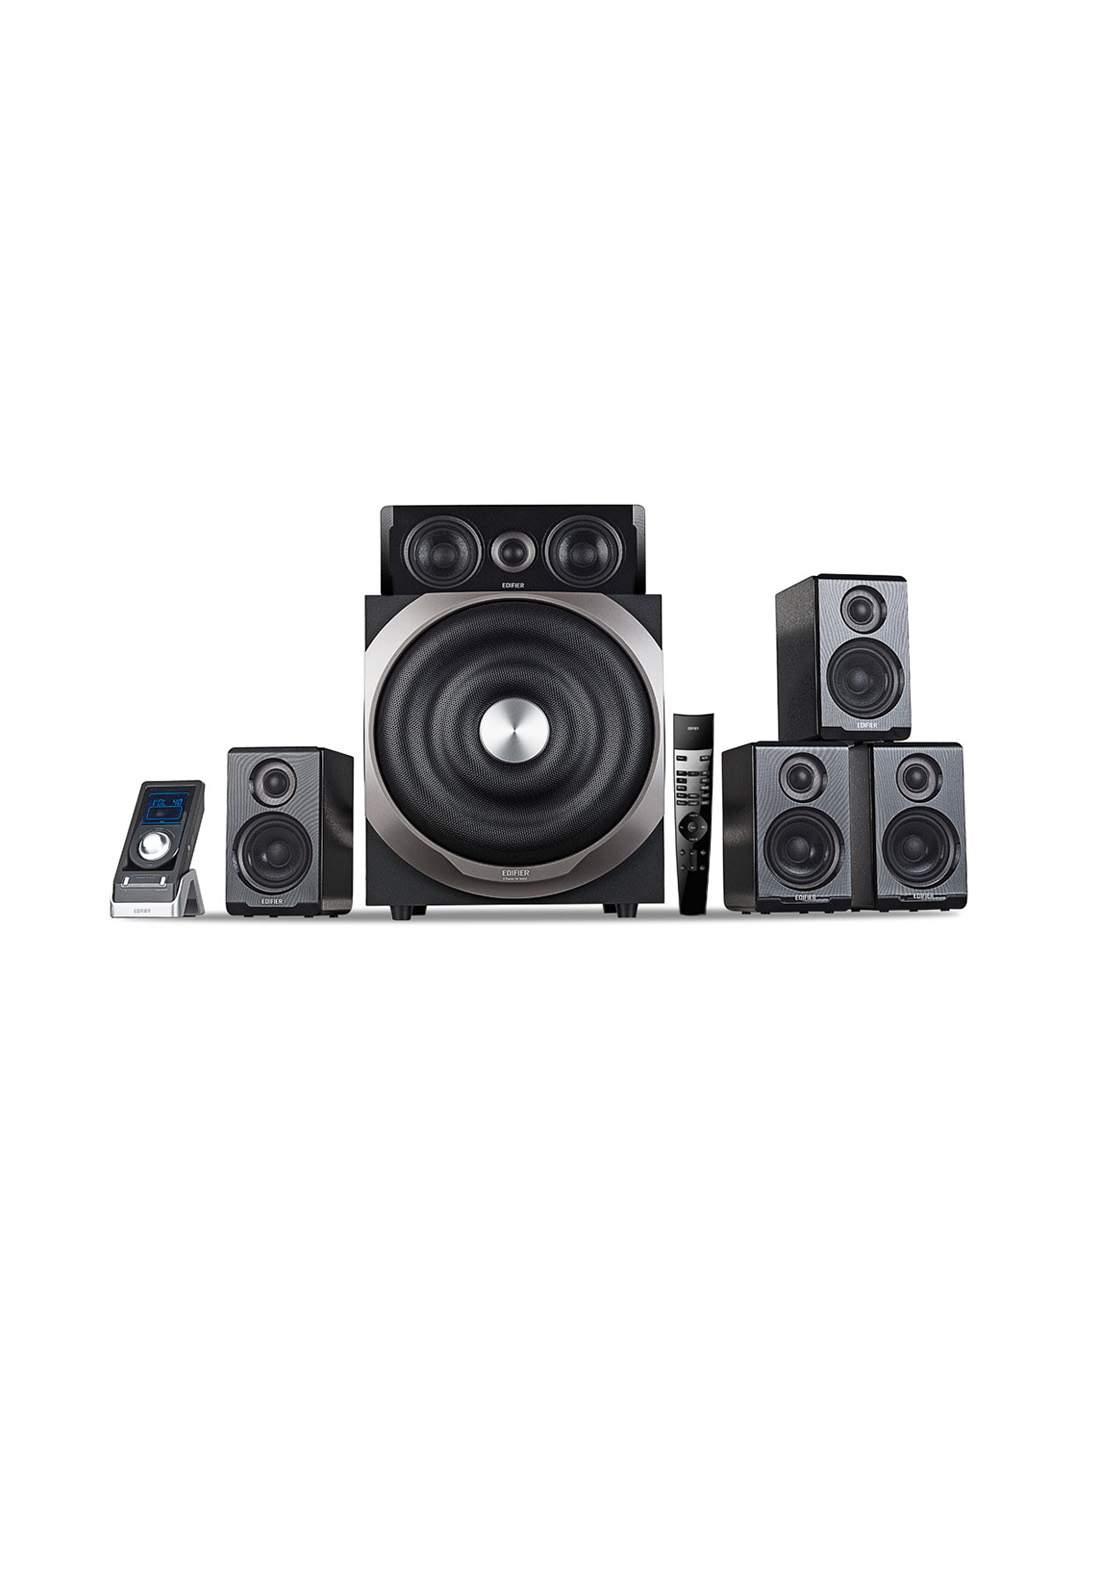 Edifier S760D 5.1 Active Multimedia Speaker System - Gray مضخم صوت